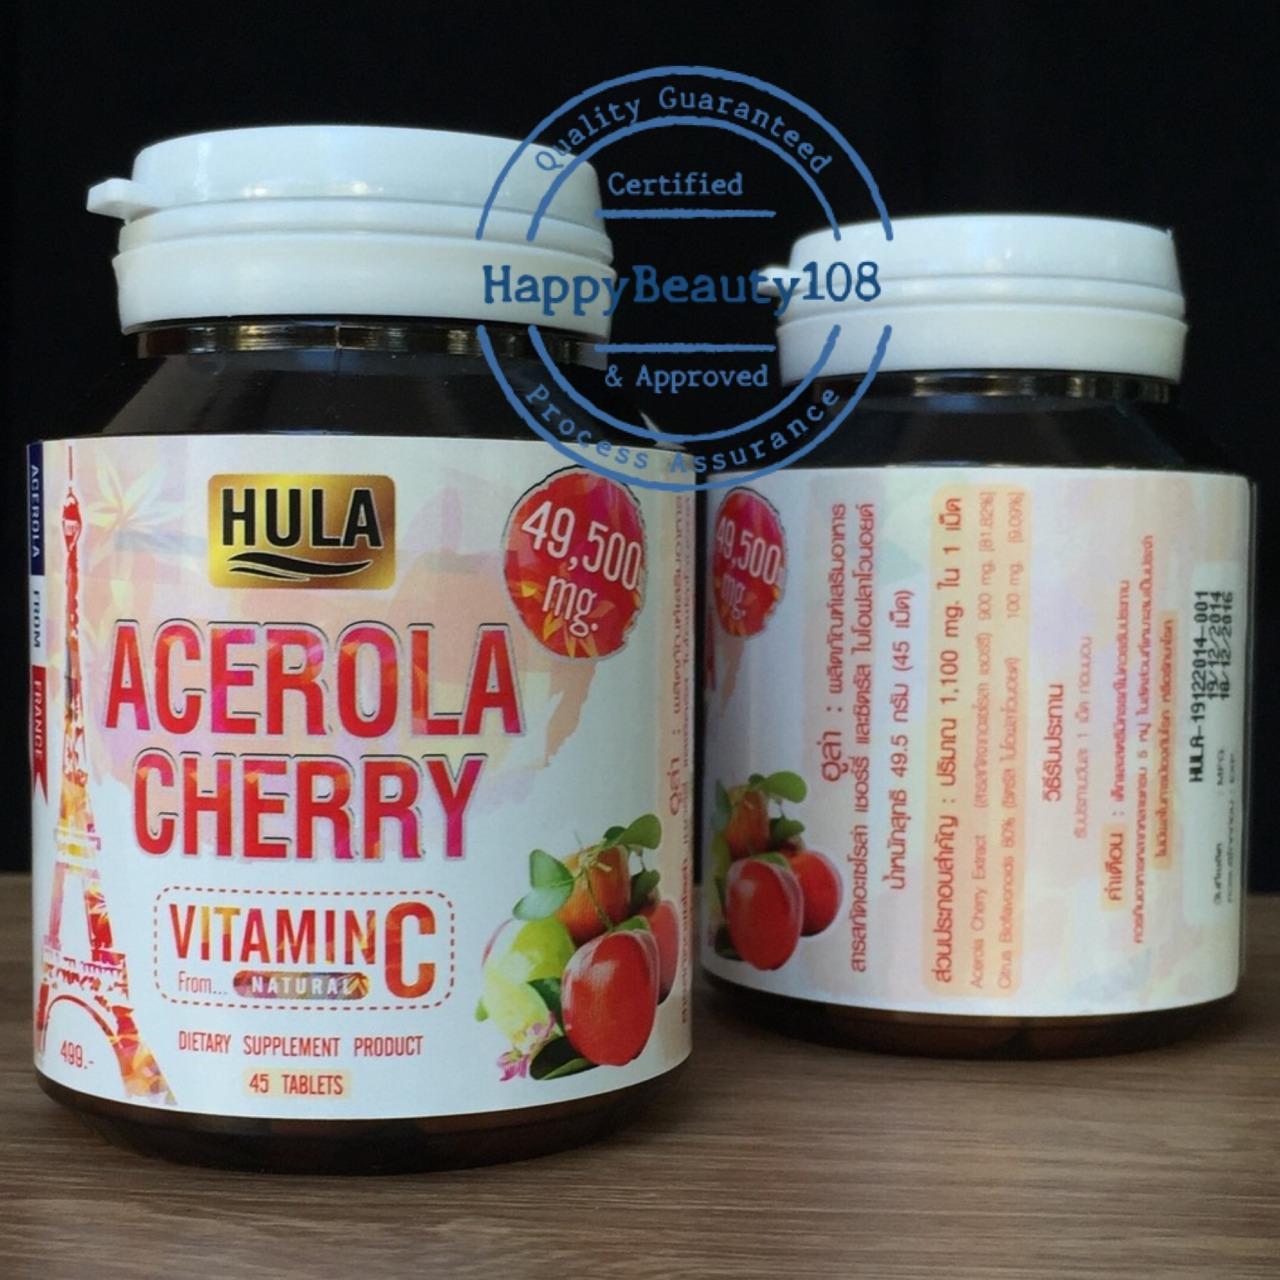 HULA Acerola Cherry Vitamin C From Natural วิตามินซีจากอะเซโรล่าเชอร์รี่ 45 Tablets